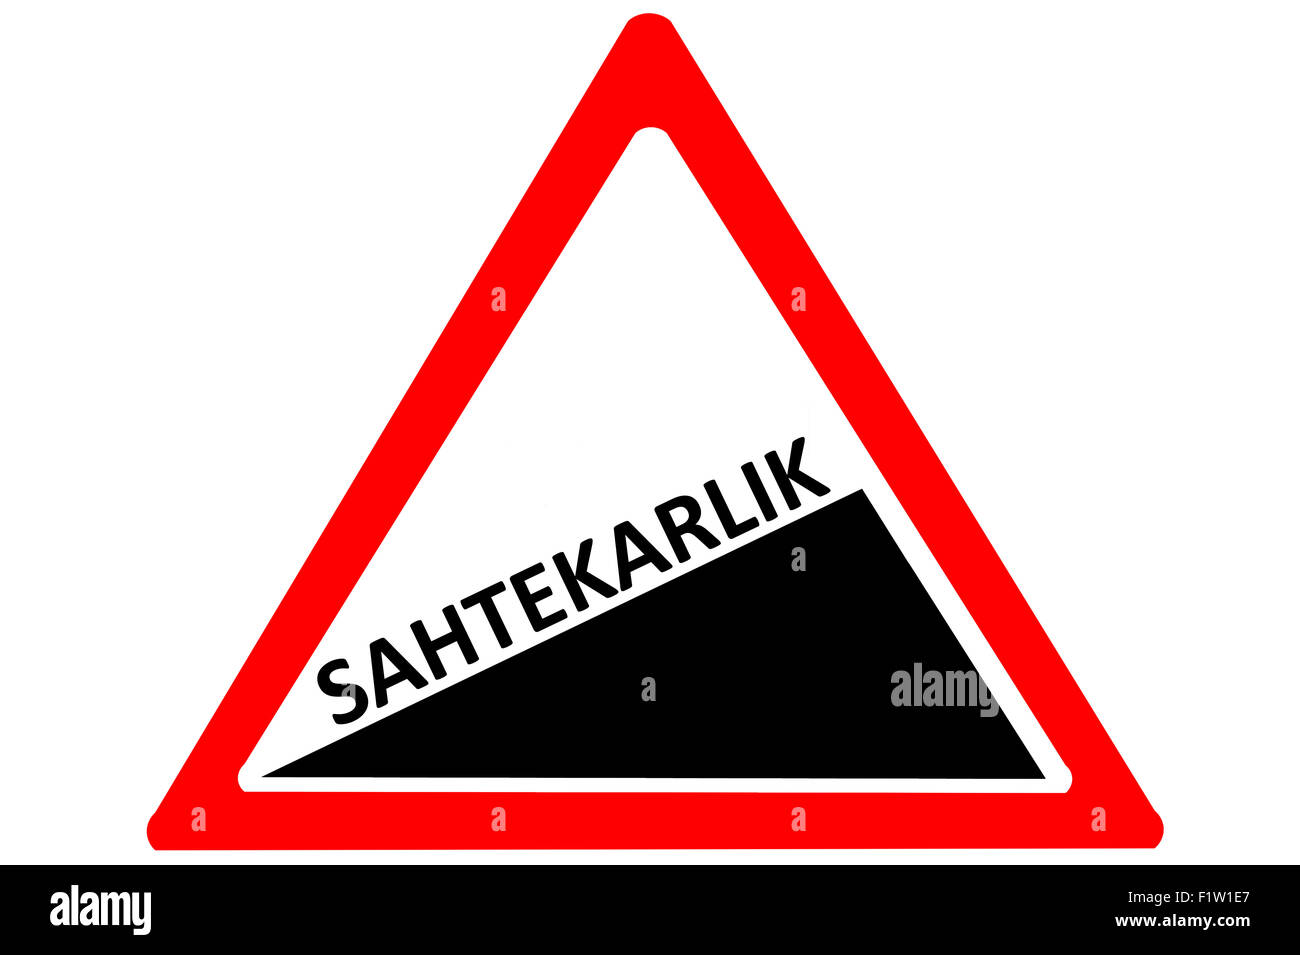 Dishonesty Turkish sahtekarlik increasing warning road sign Red and White Triangle  isolated on a white background - Stock Image